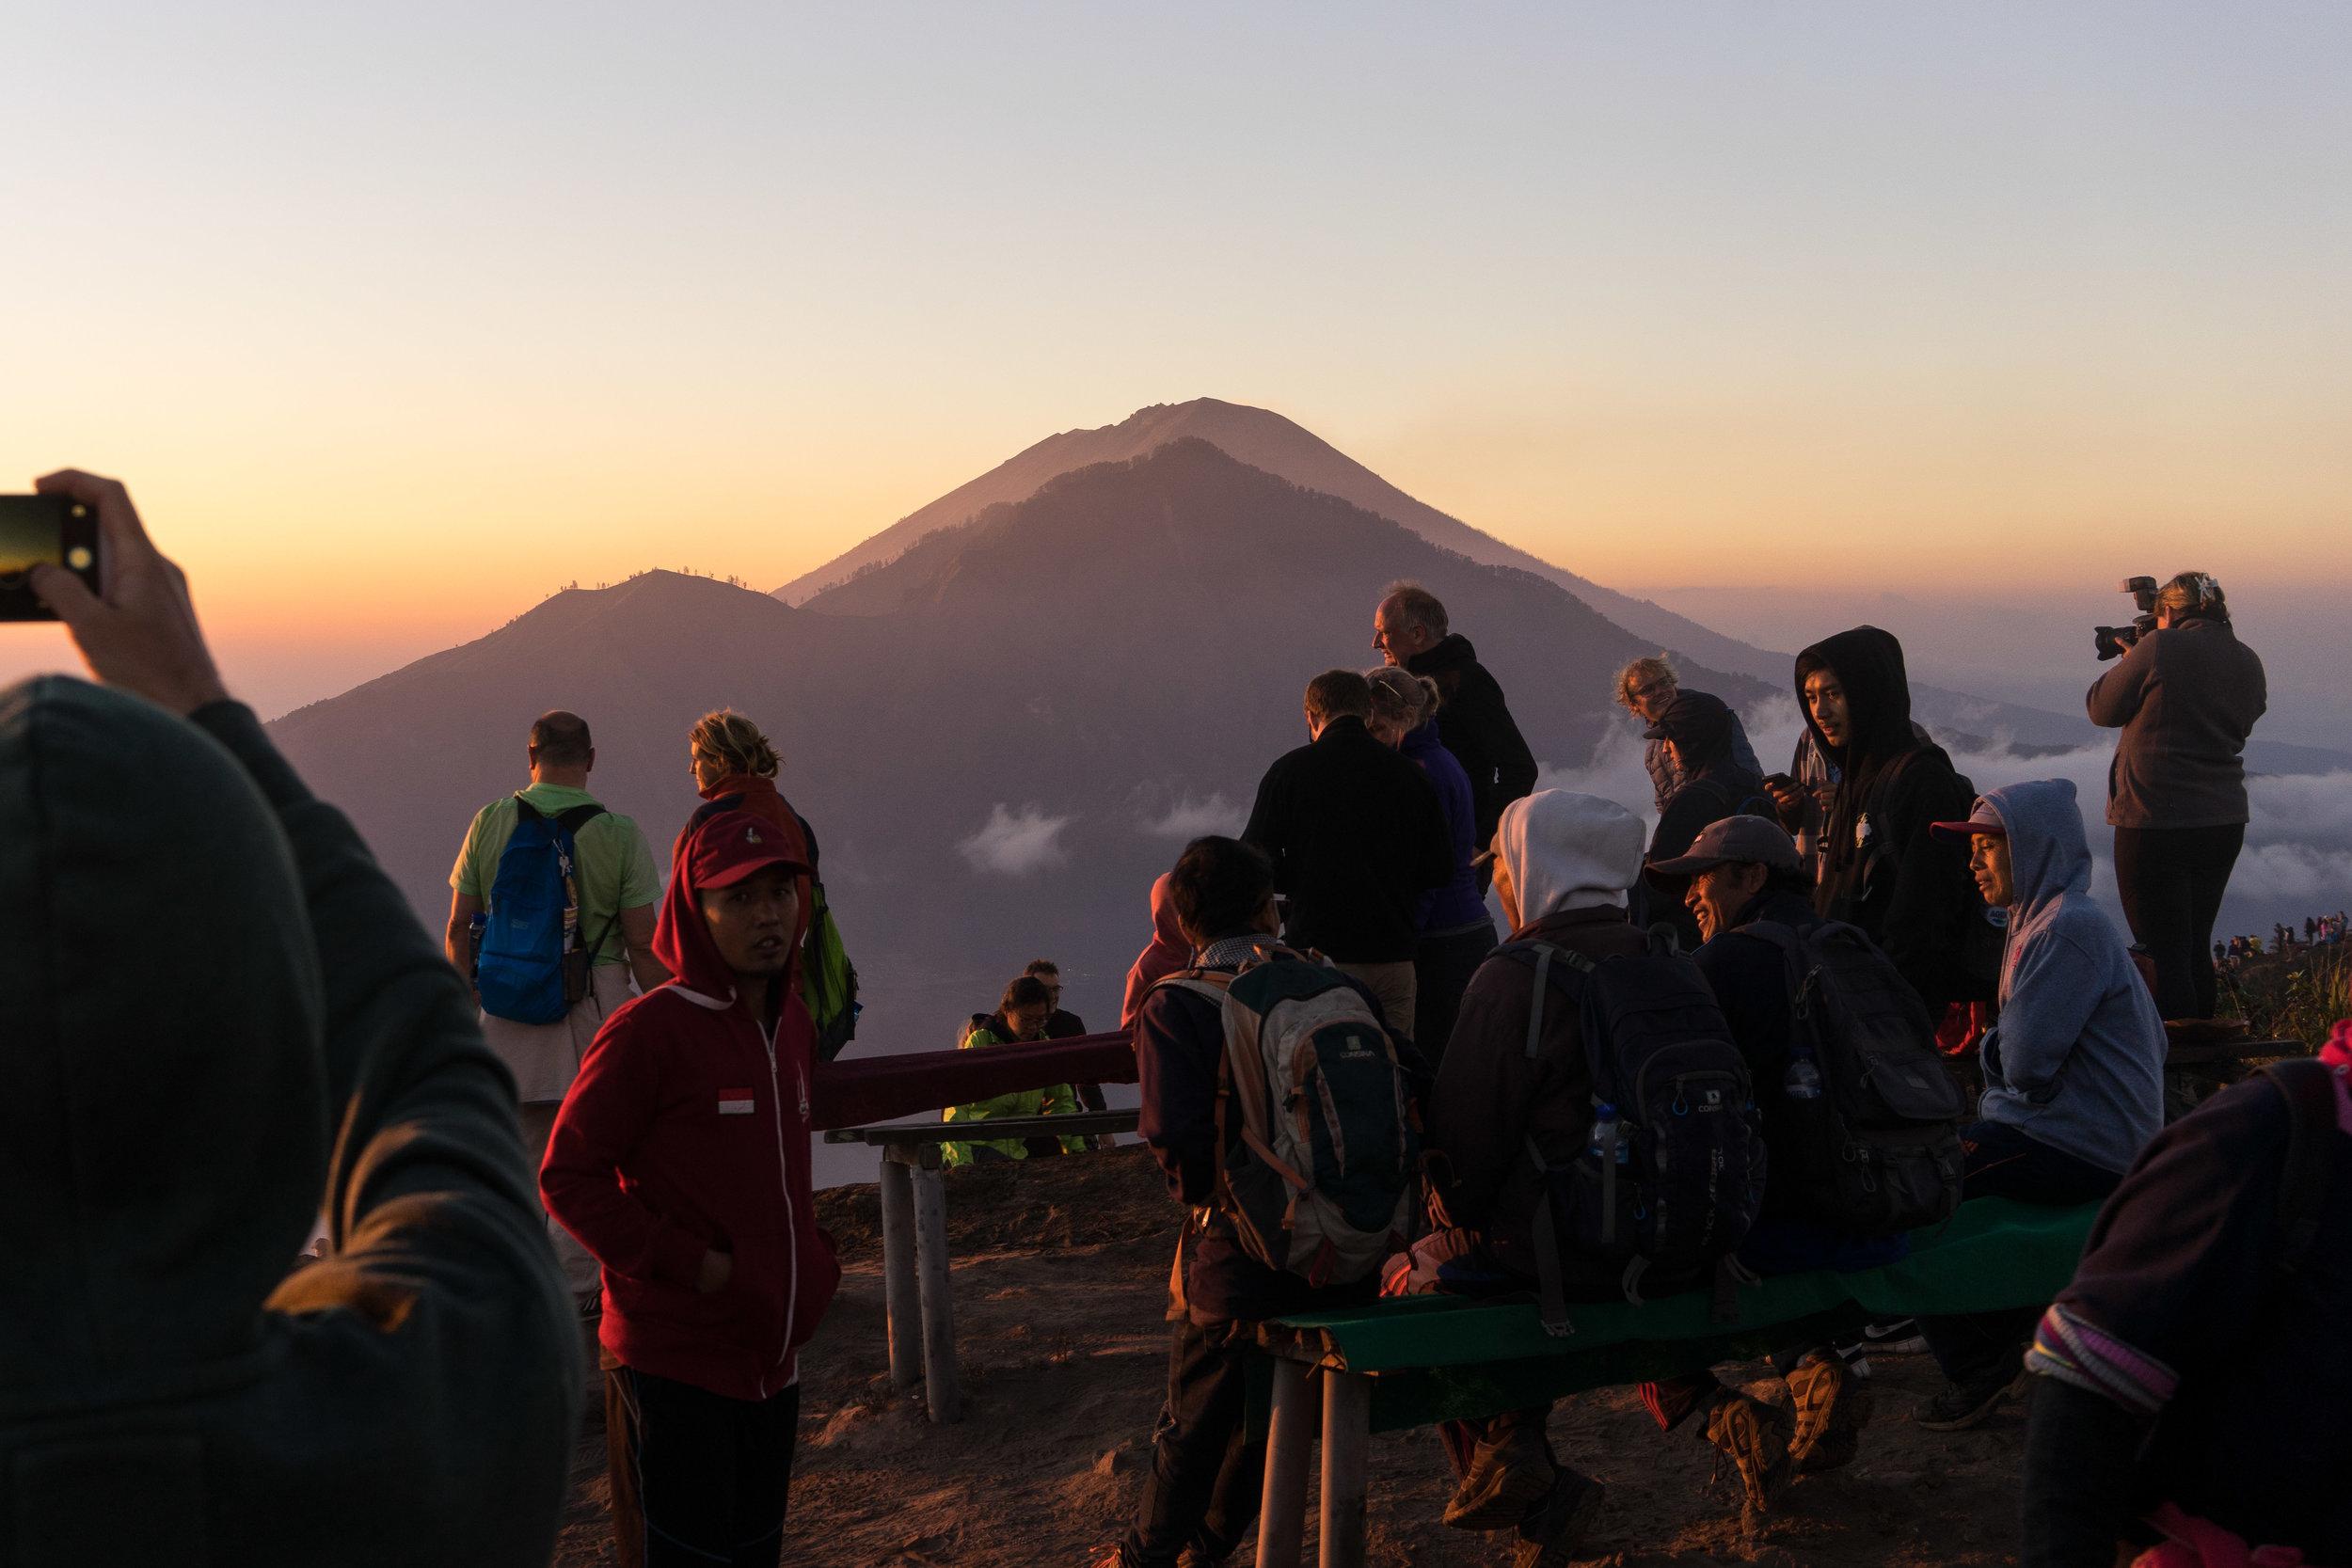 Mount Batur, Kintamani, Bali